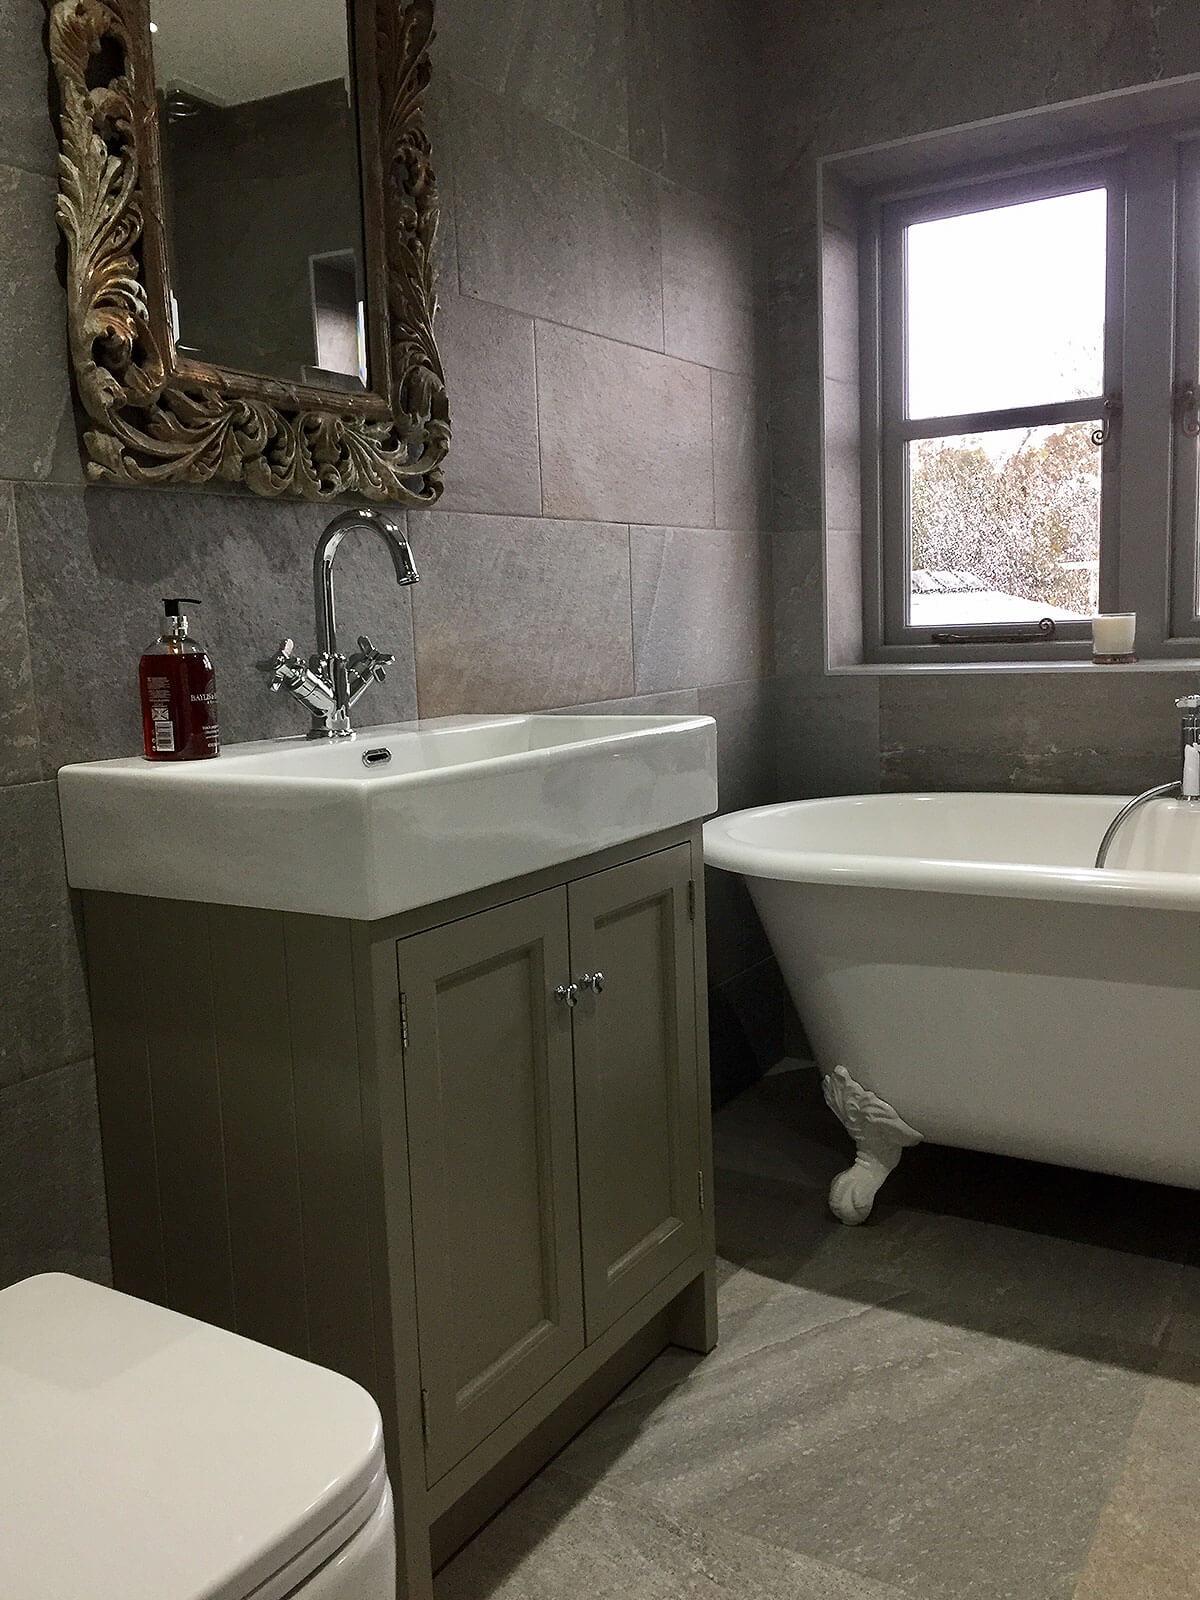 Shropshire Bathroom Floor Tiles